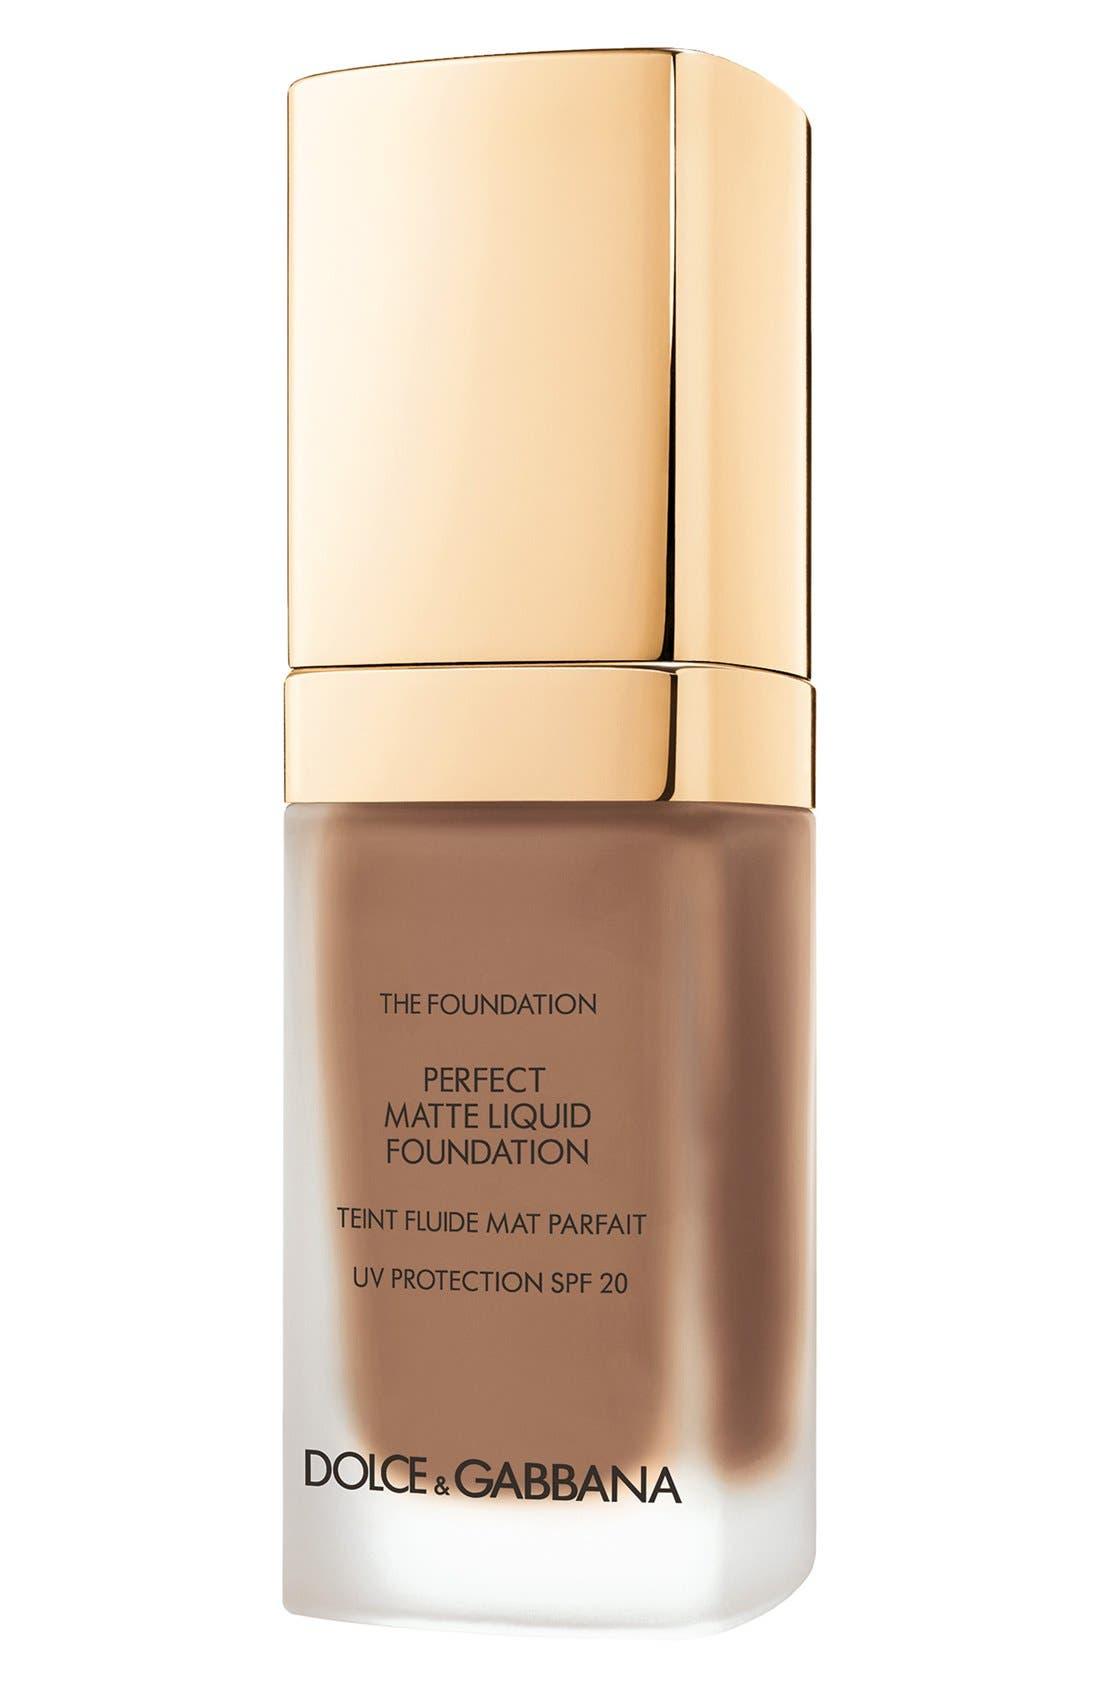 Dolce&Gabbana Beauty Perfect Matte Liquid Foundation